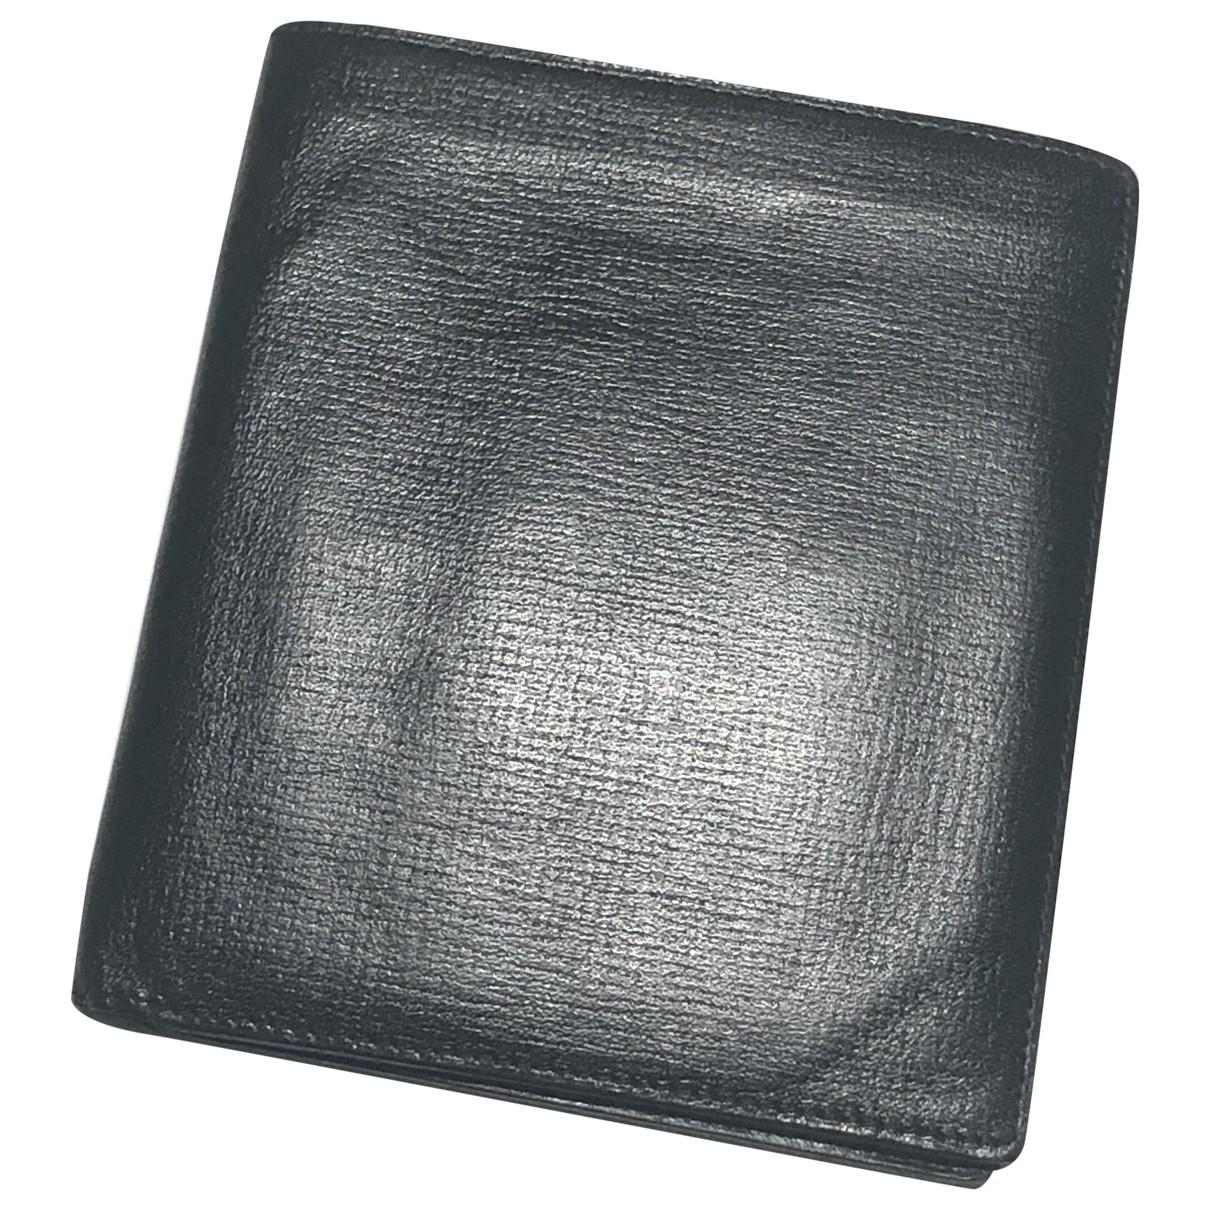 Valextra \N Black Leather Small bag, wallet & cases for Men \N